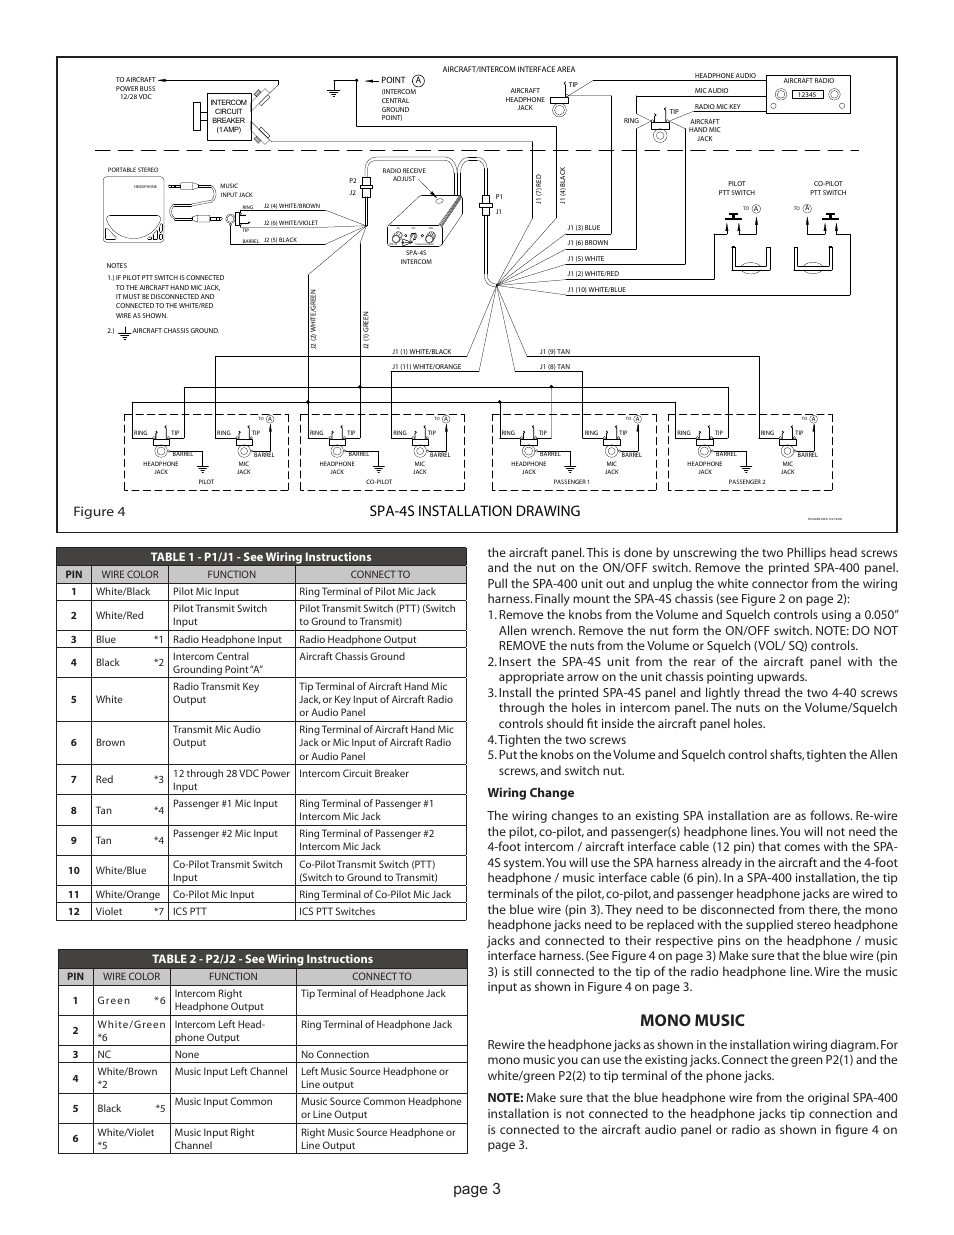 Sigtronics Headset Wiring Diagram Largest Database Sennheiser Microphone Mono Music Spa 4s Installation Drawing Page 3 4sn Rh Manualsdir Com Mic